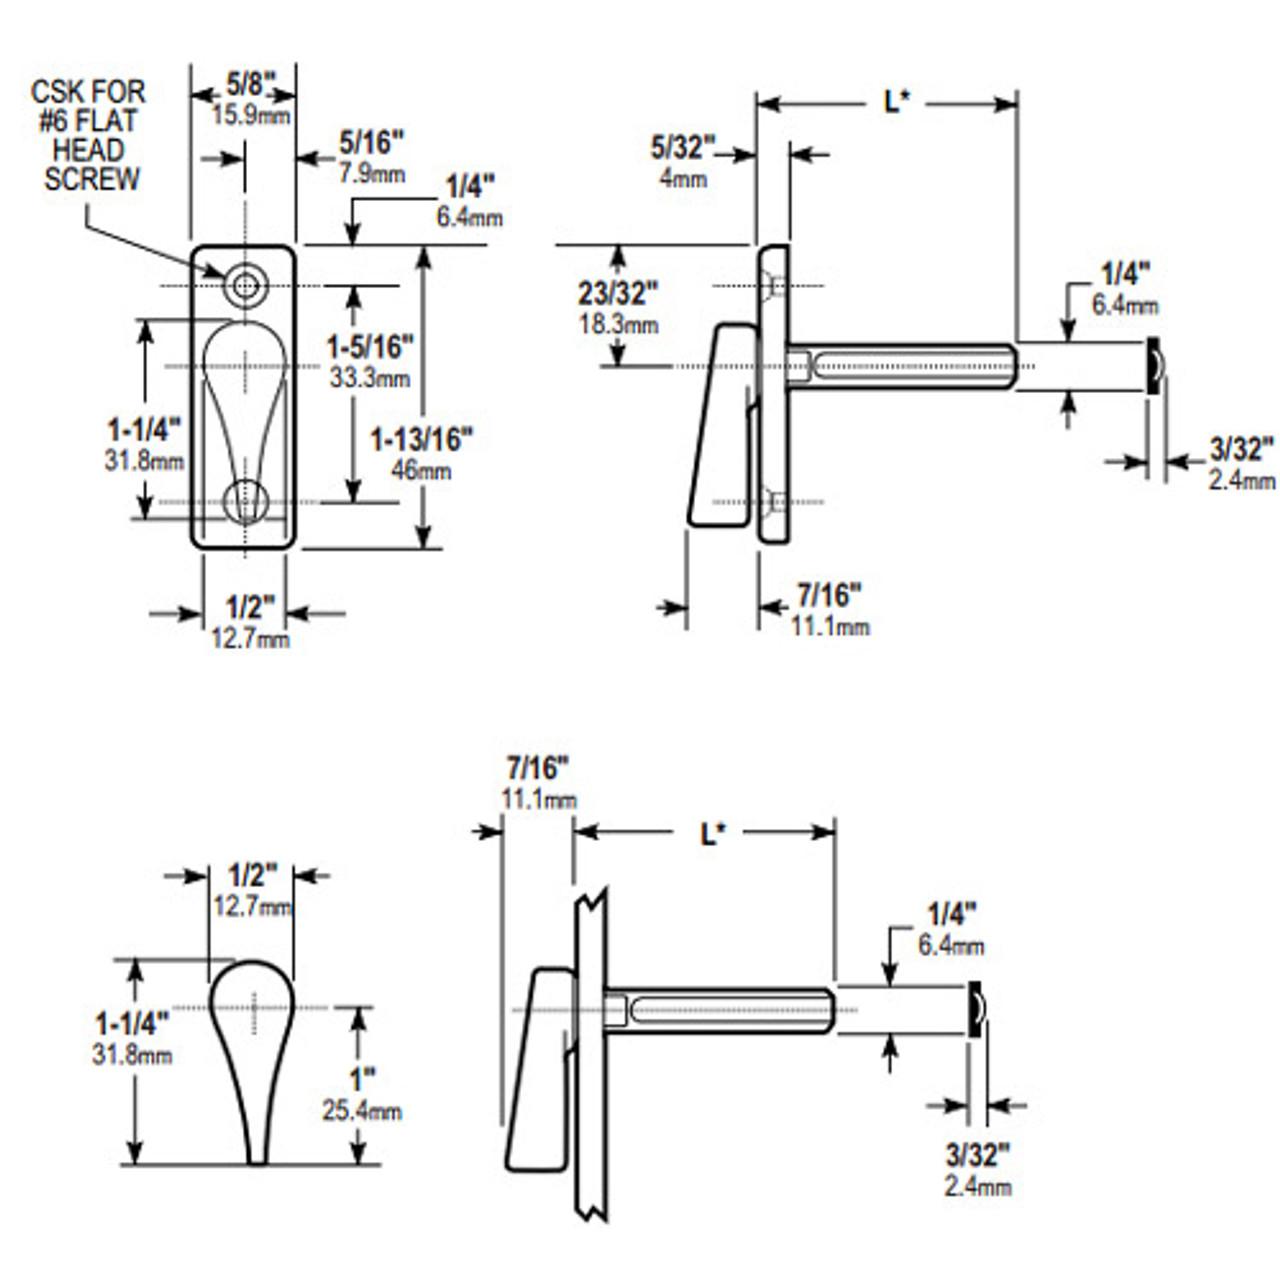 1000-02-28-119 Adams Rite 1000 Series Turns Dimensional View